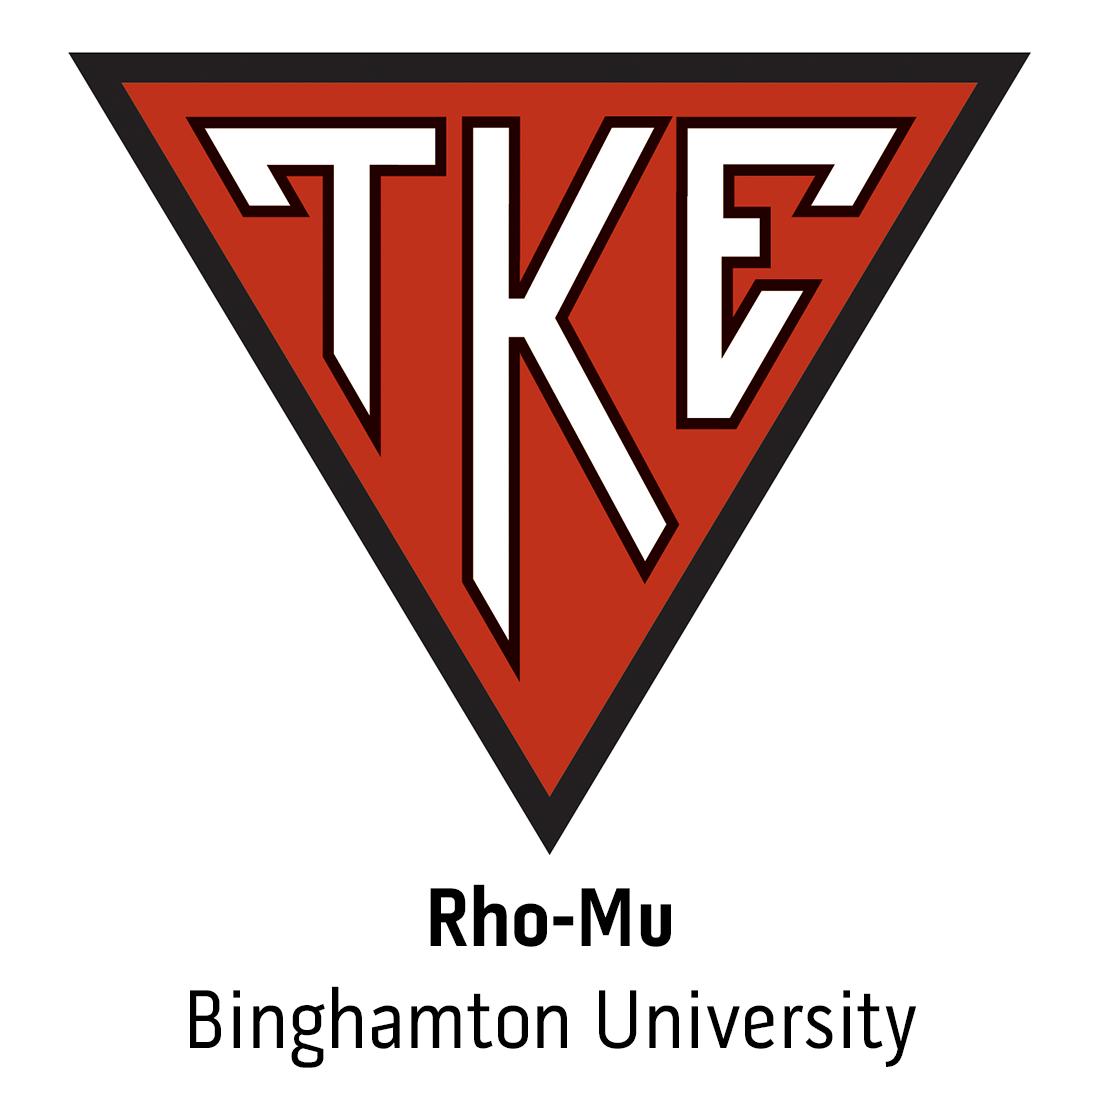 Rho-Mu Chapter at Binghamton University-SUNY